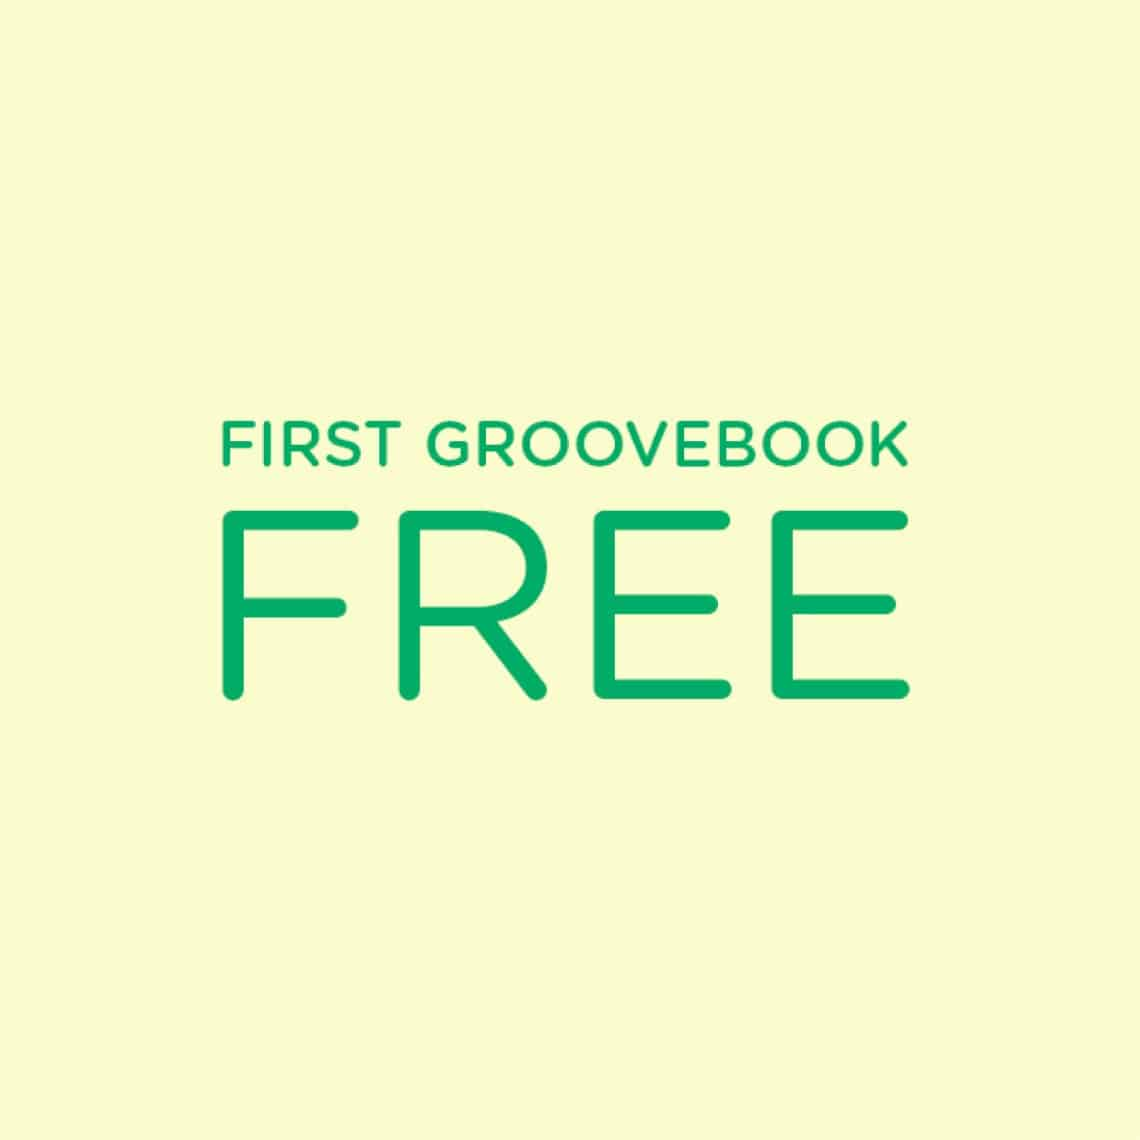 First Groovebook Free - Design Agency - Citizen Best